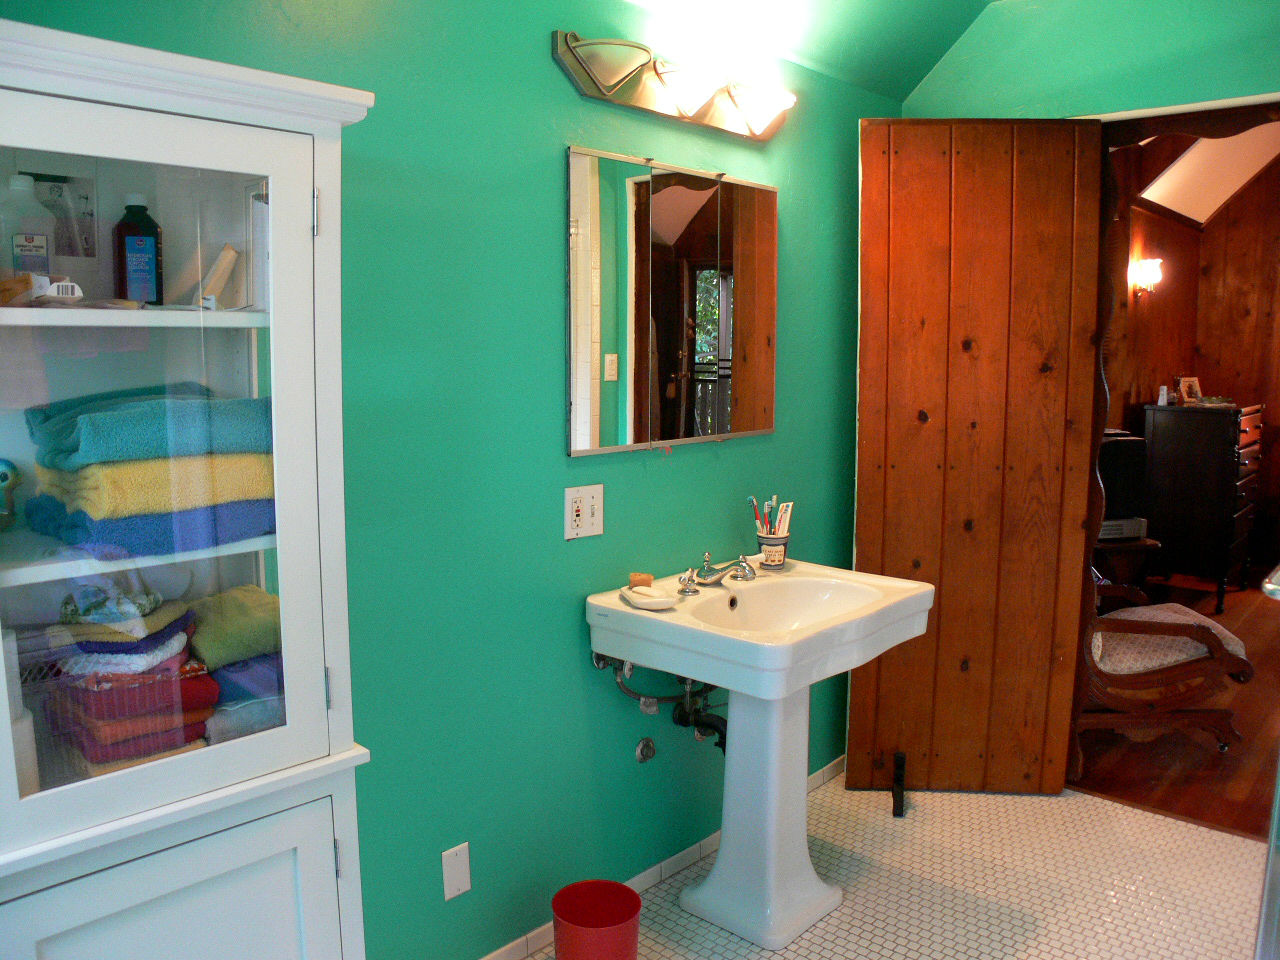 Alternate view of master bathroom.